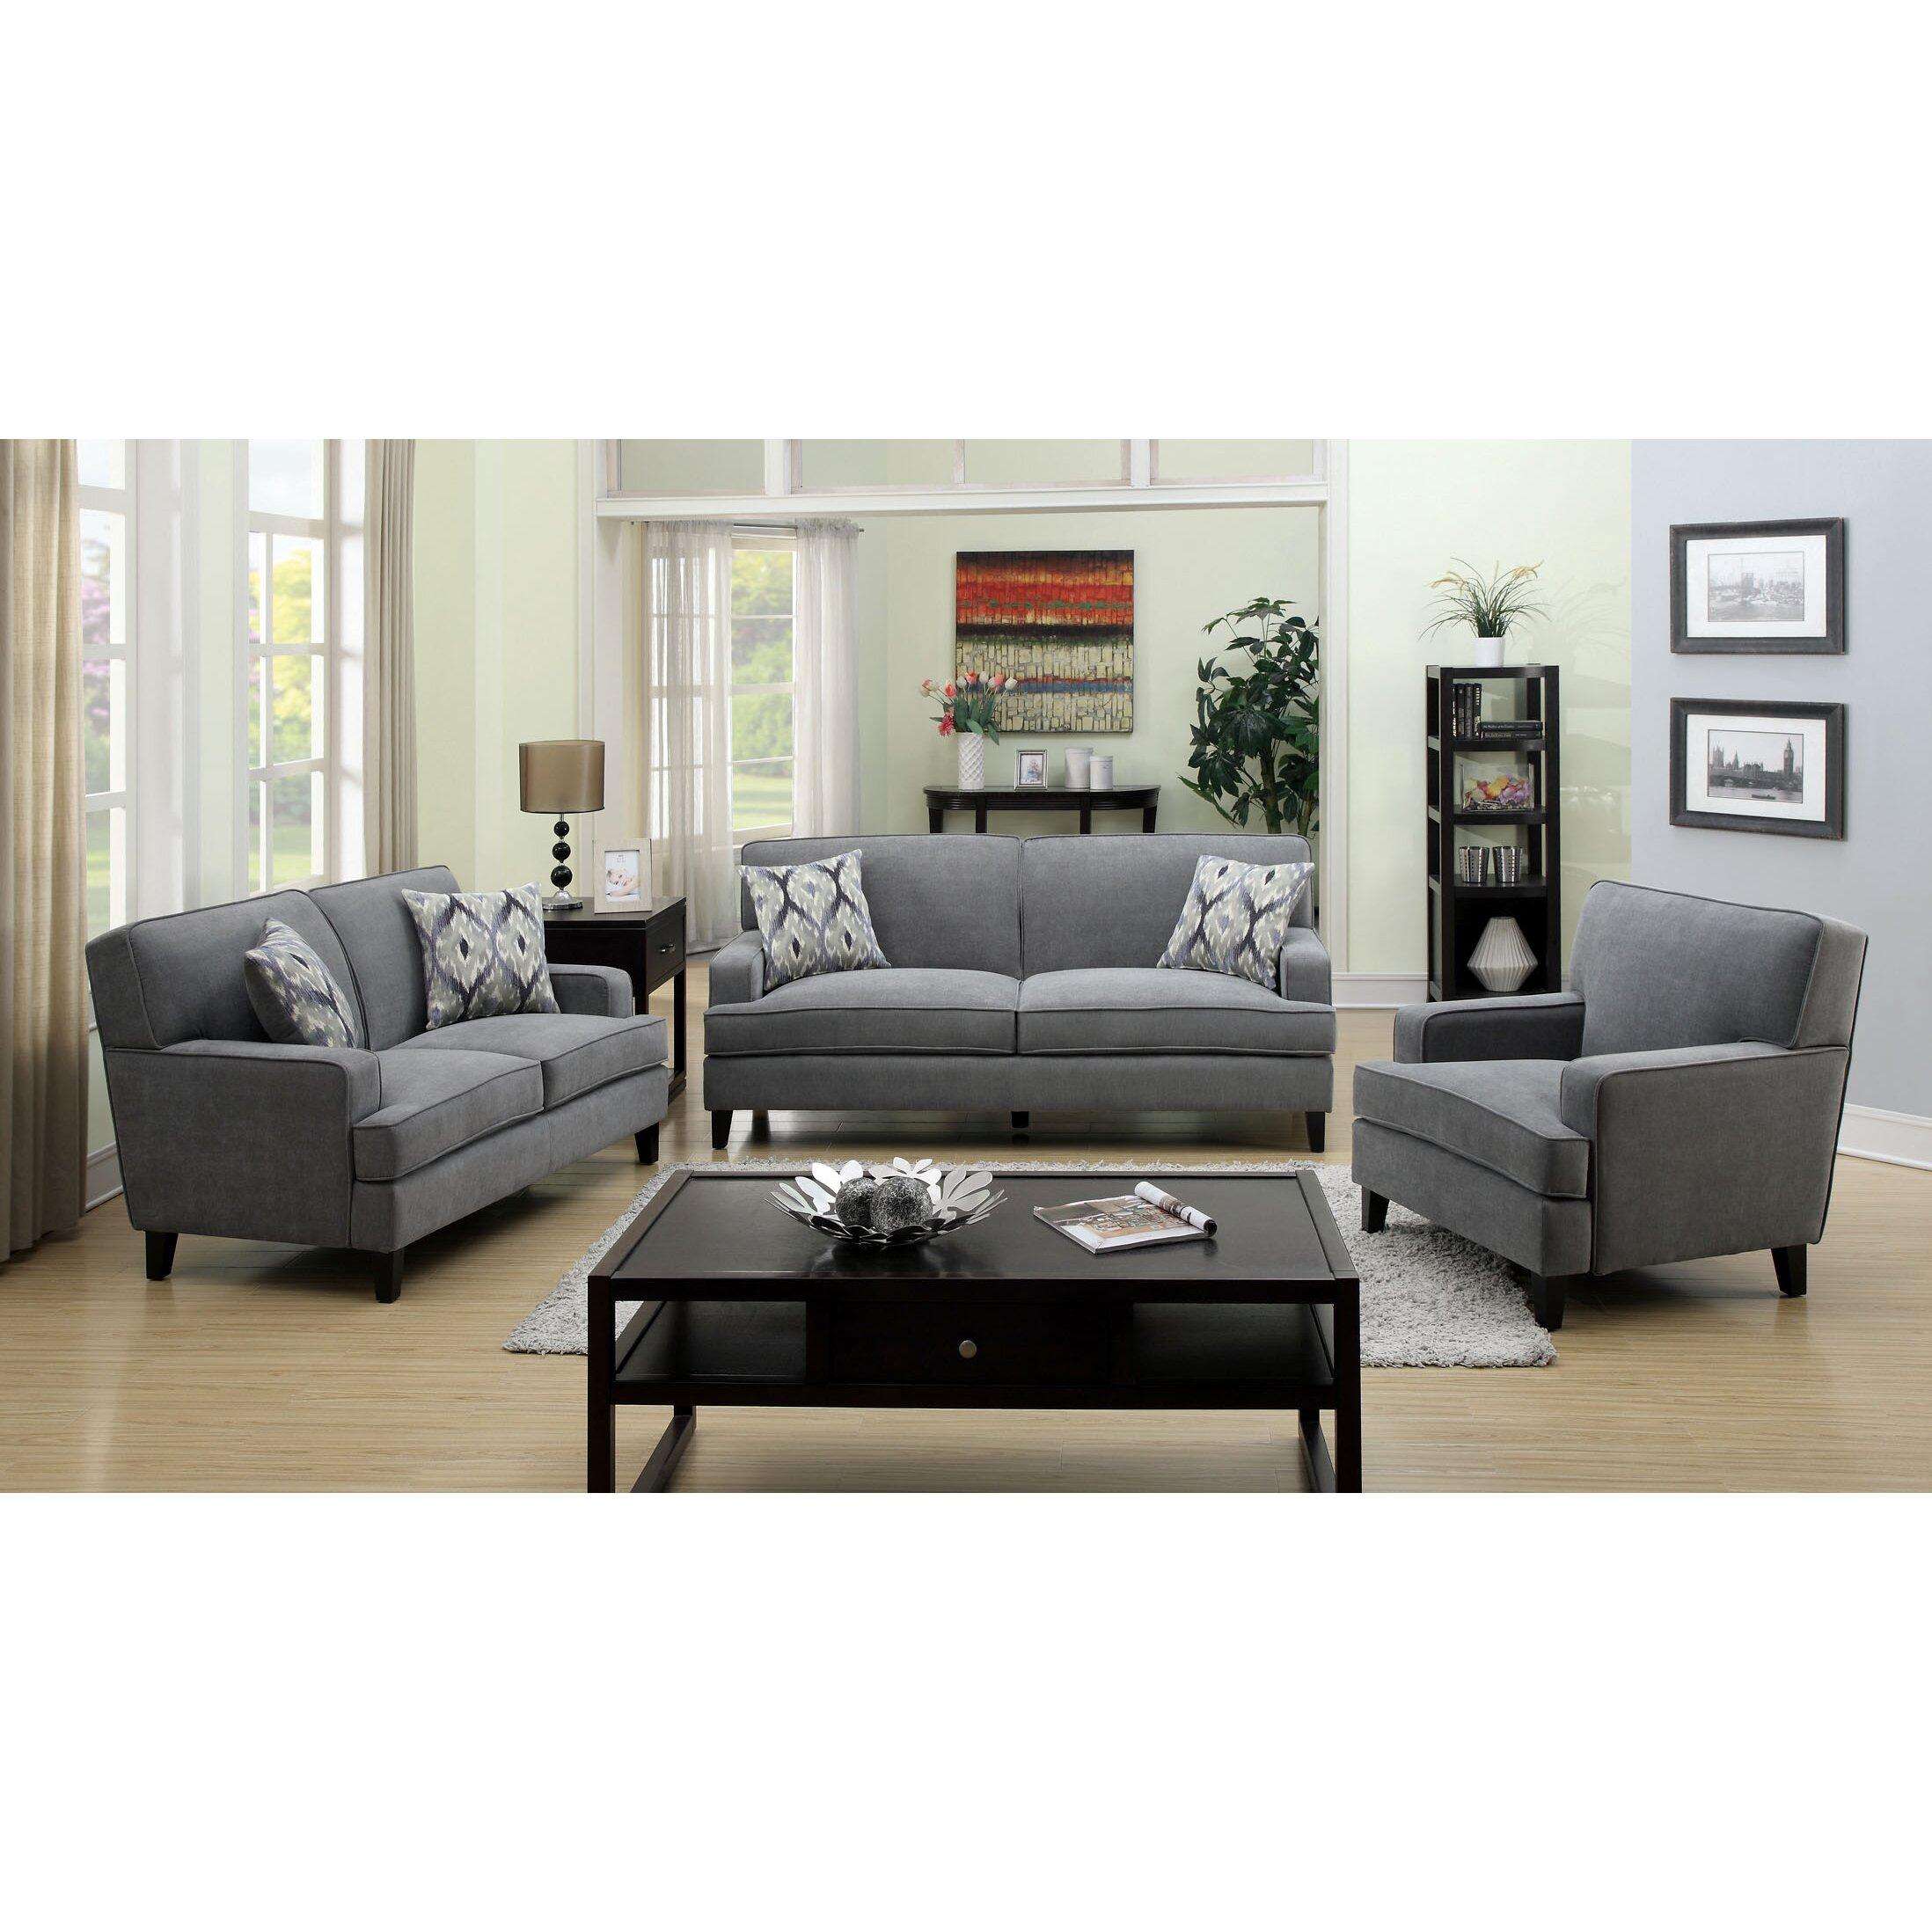 Hokku designs leyna modern arm chair reviews wayfair for Hokku designs living room furniture